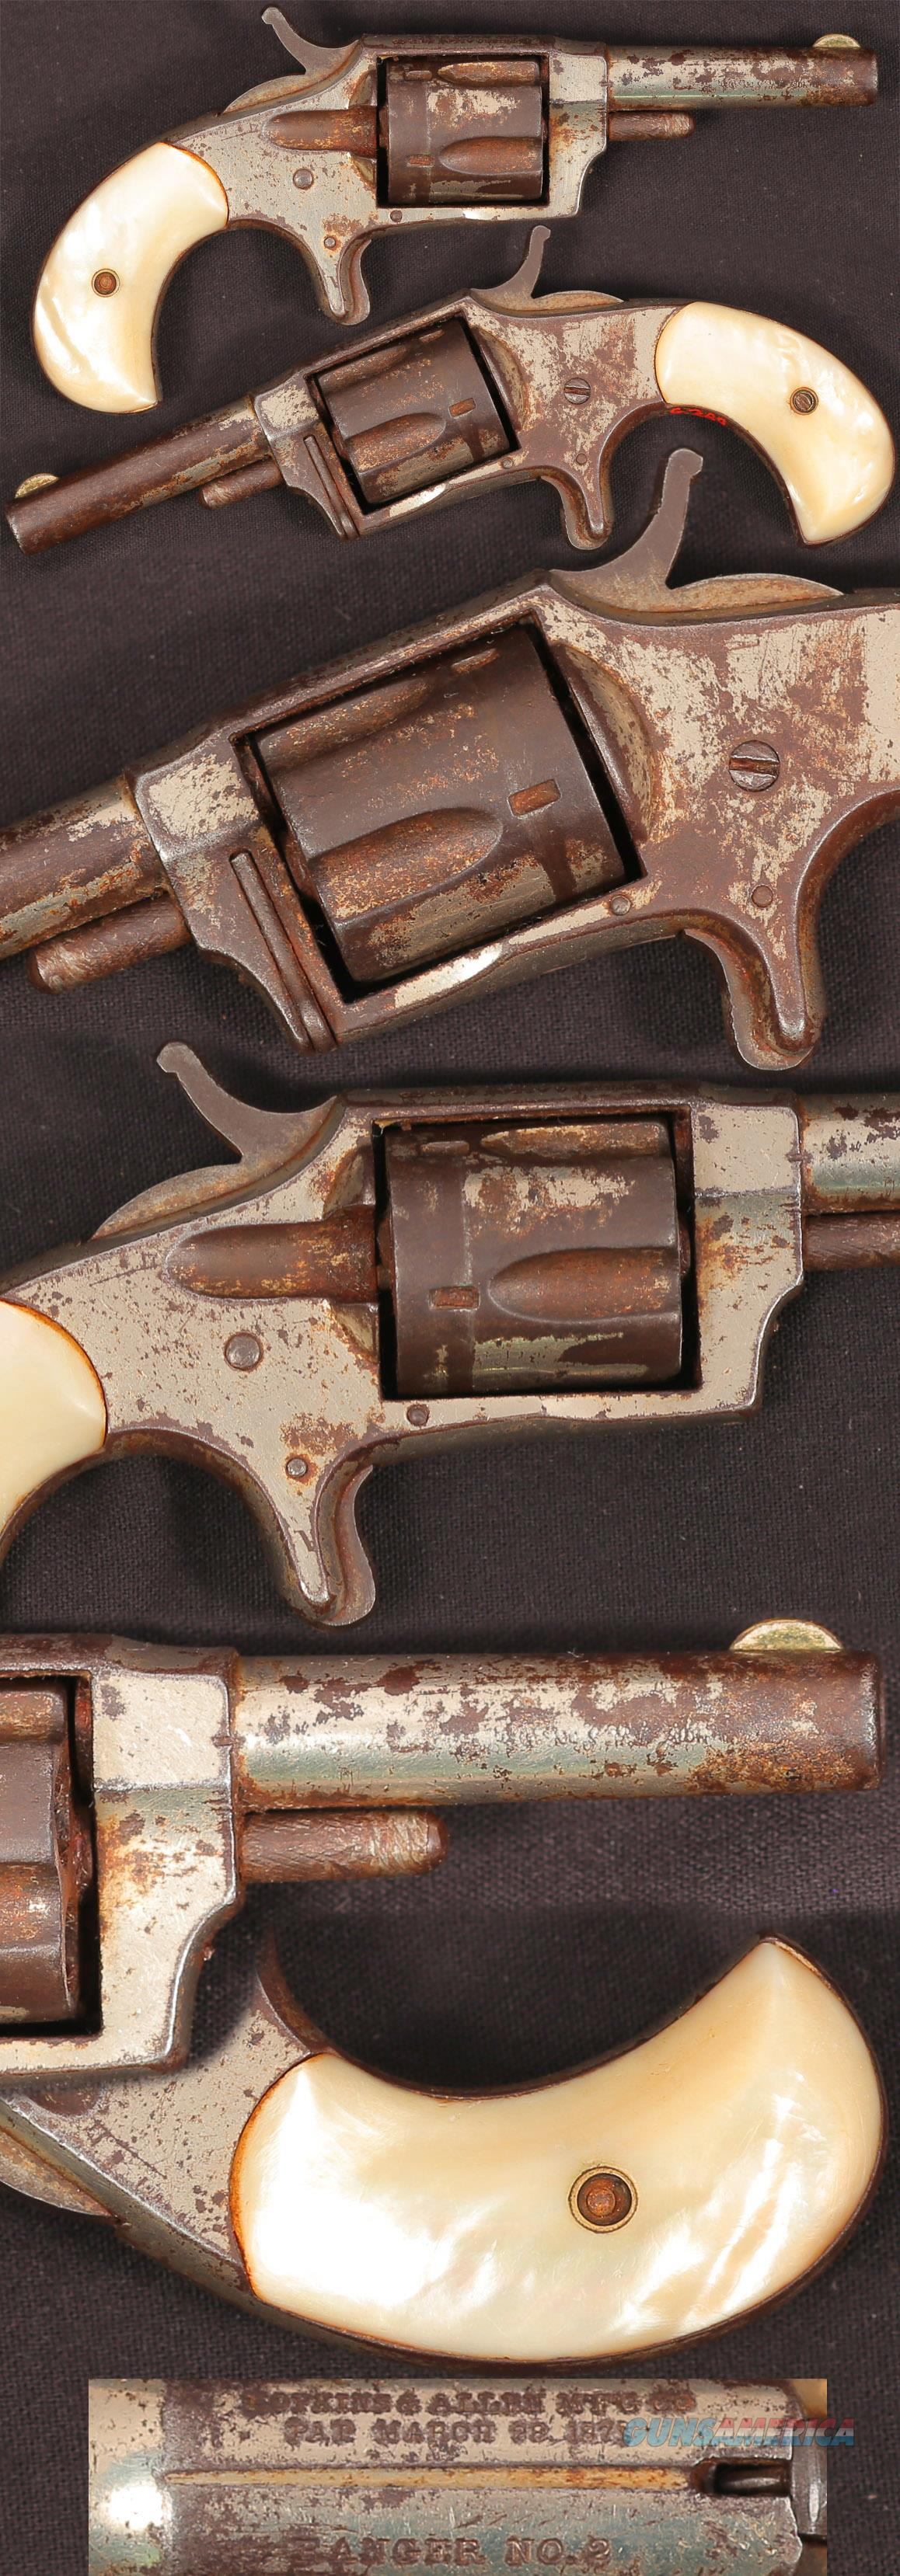 Hopkins & Allen Ranger No 2 32 revolver  Guns > Pistols > Antique (Pre-1899) Pistols - Ctg. Misc.